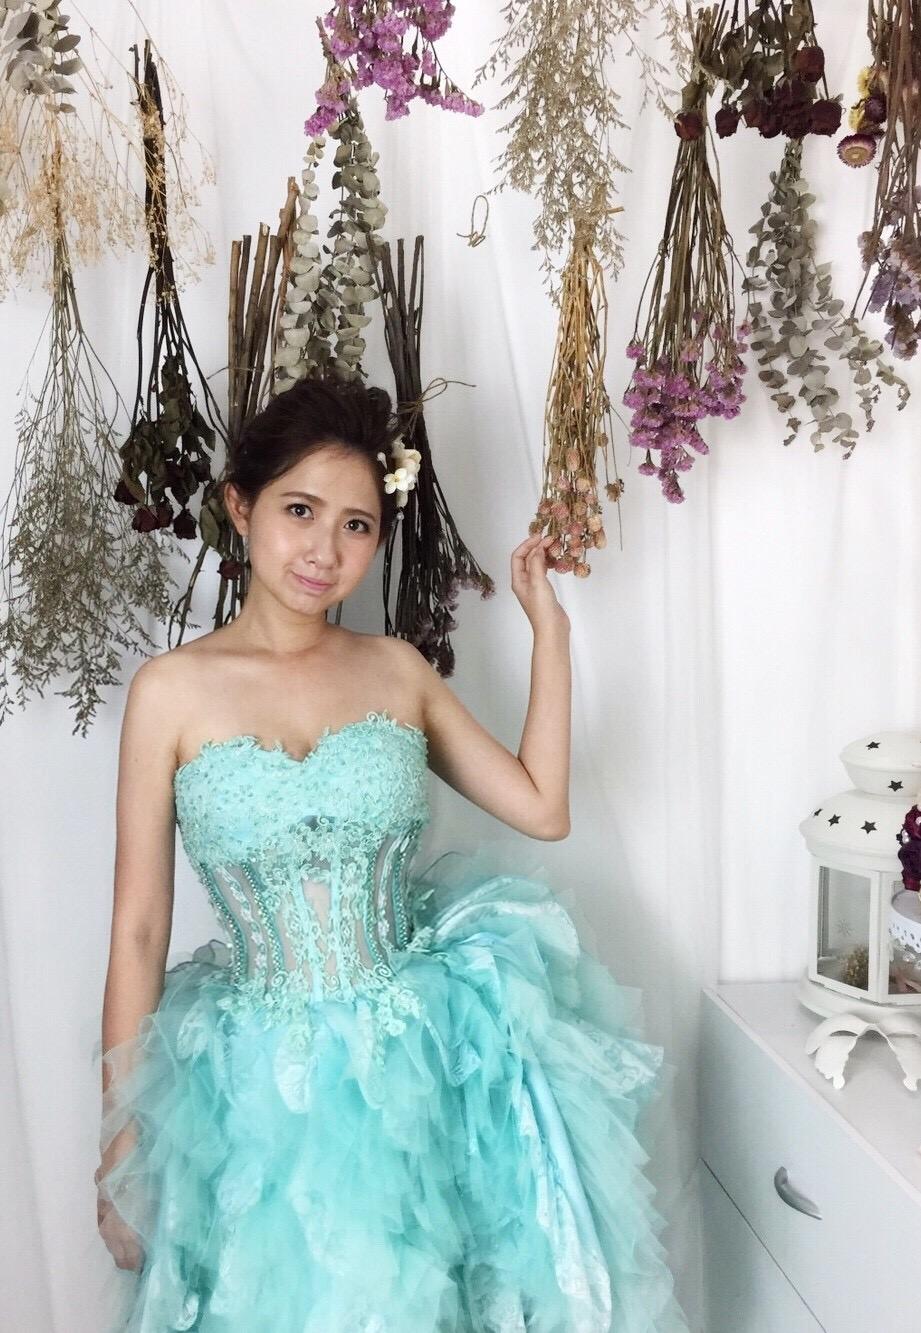 IMG_4339 - Ada Cheng - 結婚吧